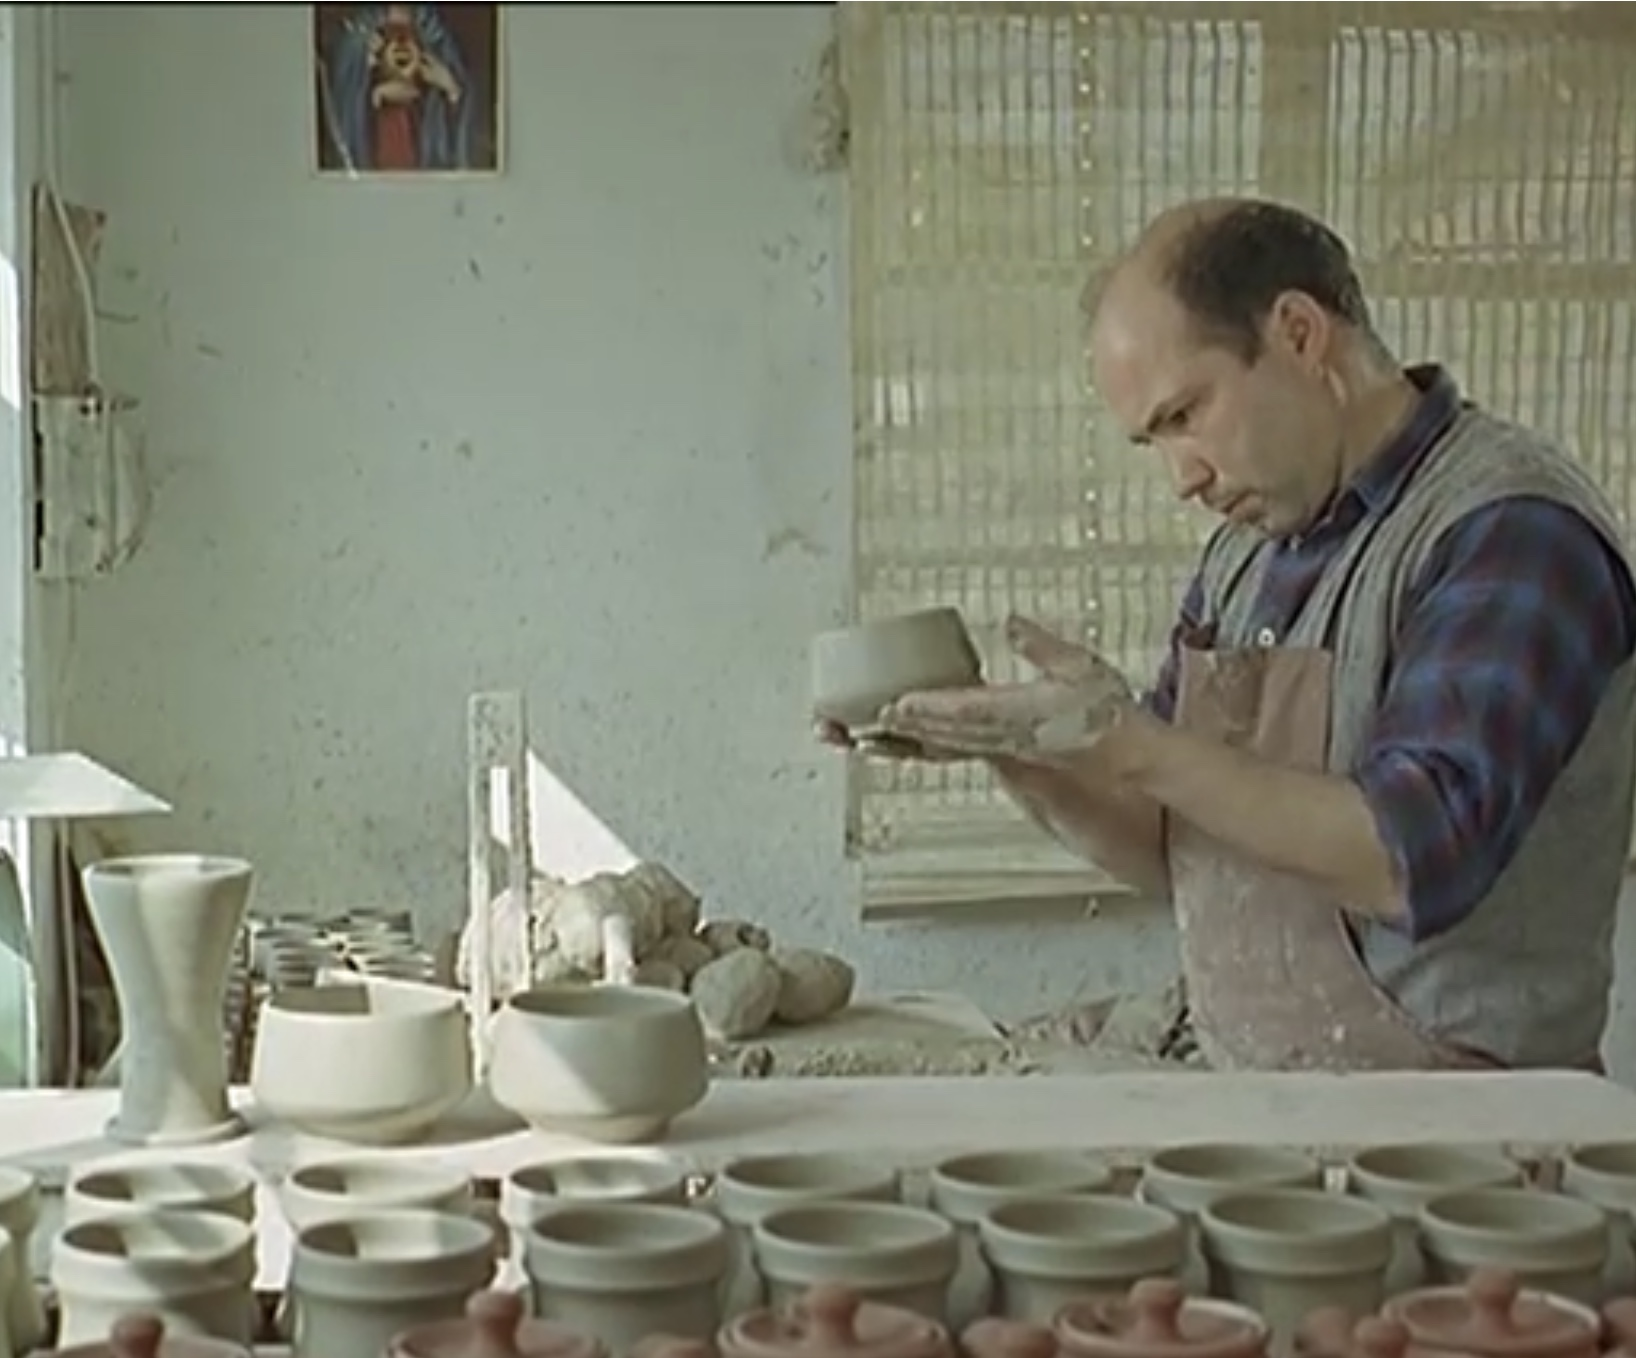 History Aylesford Pottery